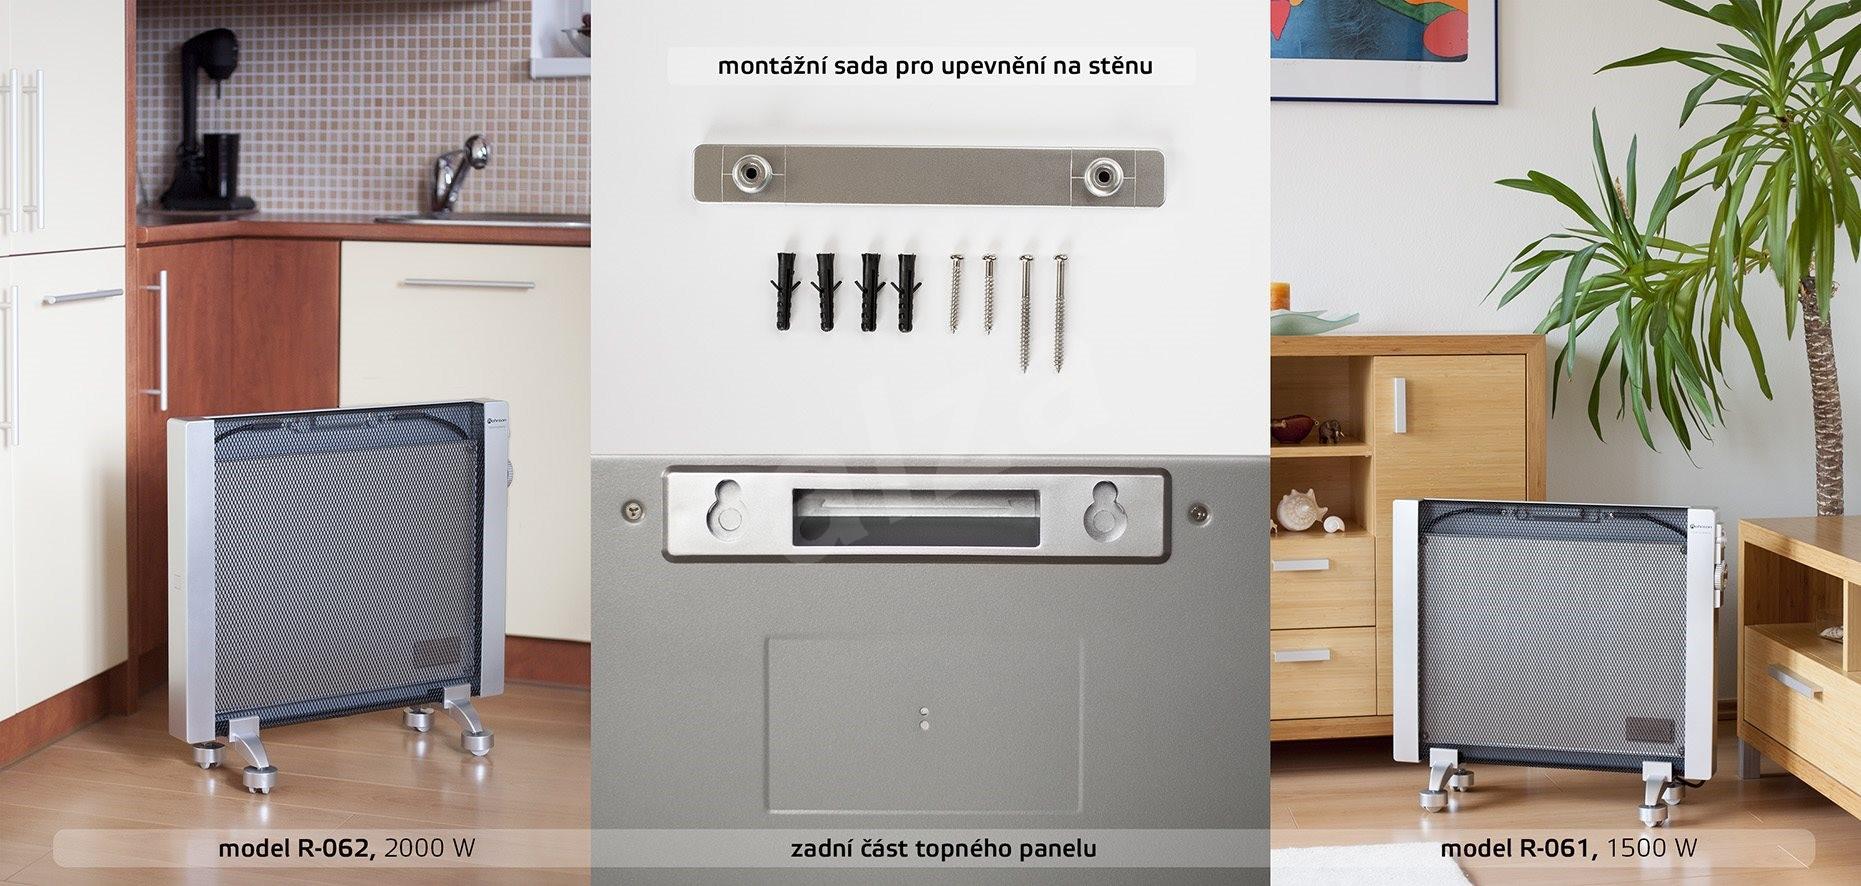 rohnson r 062 neue elektroheizung. Black Bedroom Furniture Sets. Home Design Ideas